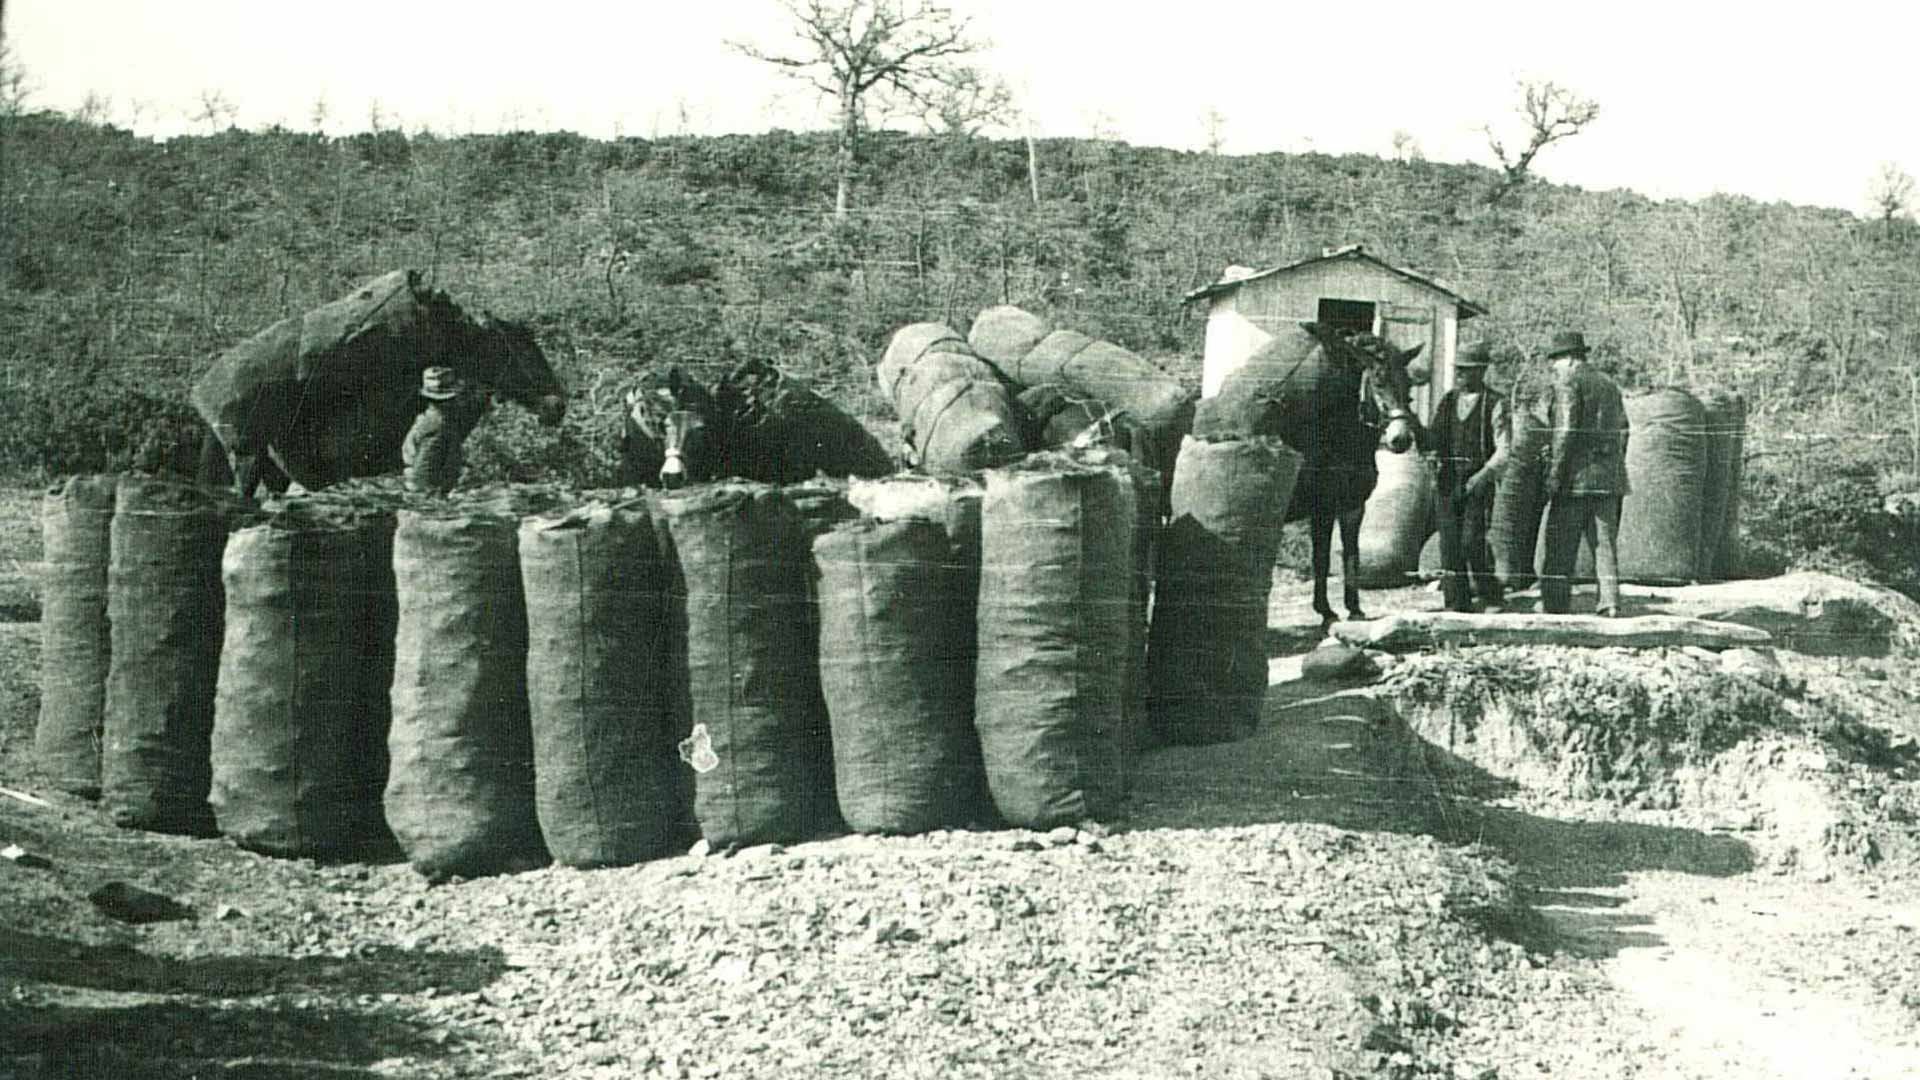 Raccolta carbone. Archivio fotografico Margaritelli.